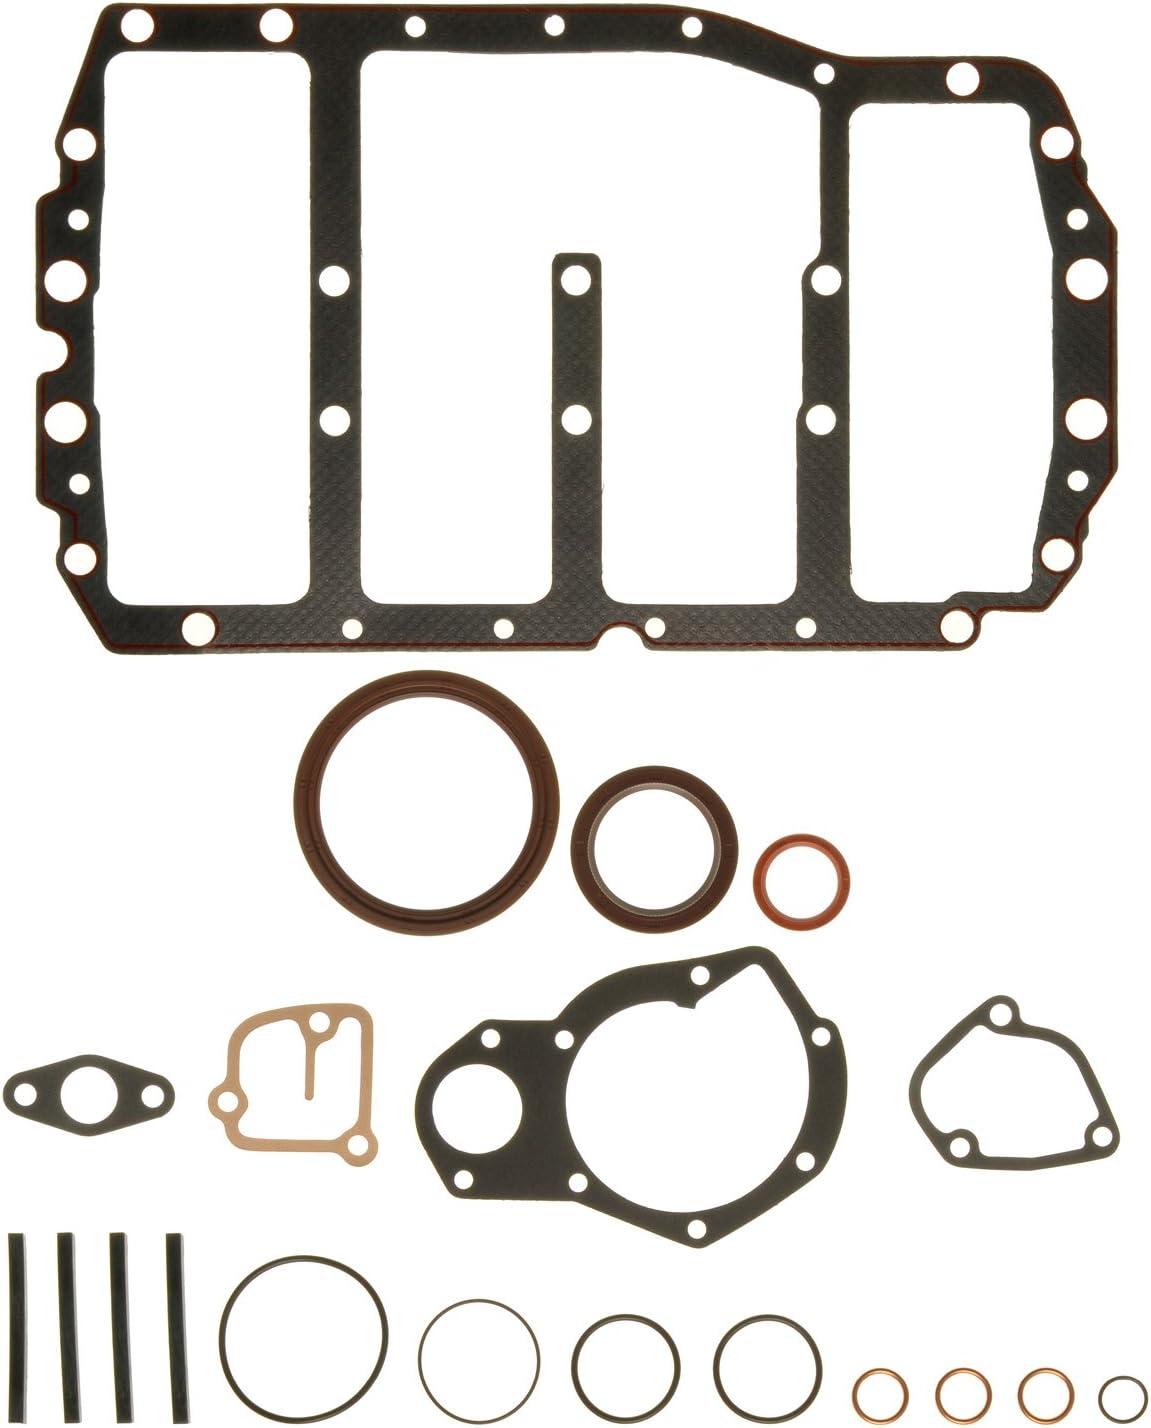 Long Beach Mall Ajusa Product 54051900 Gasket case Set crank